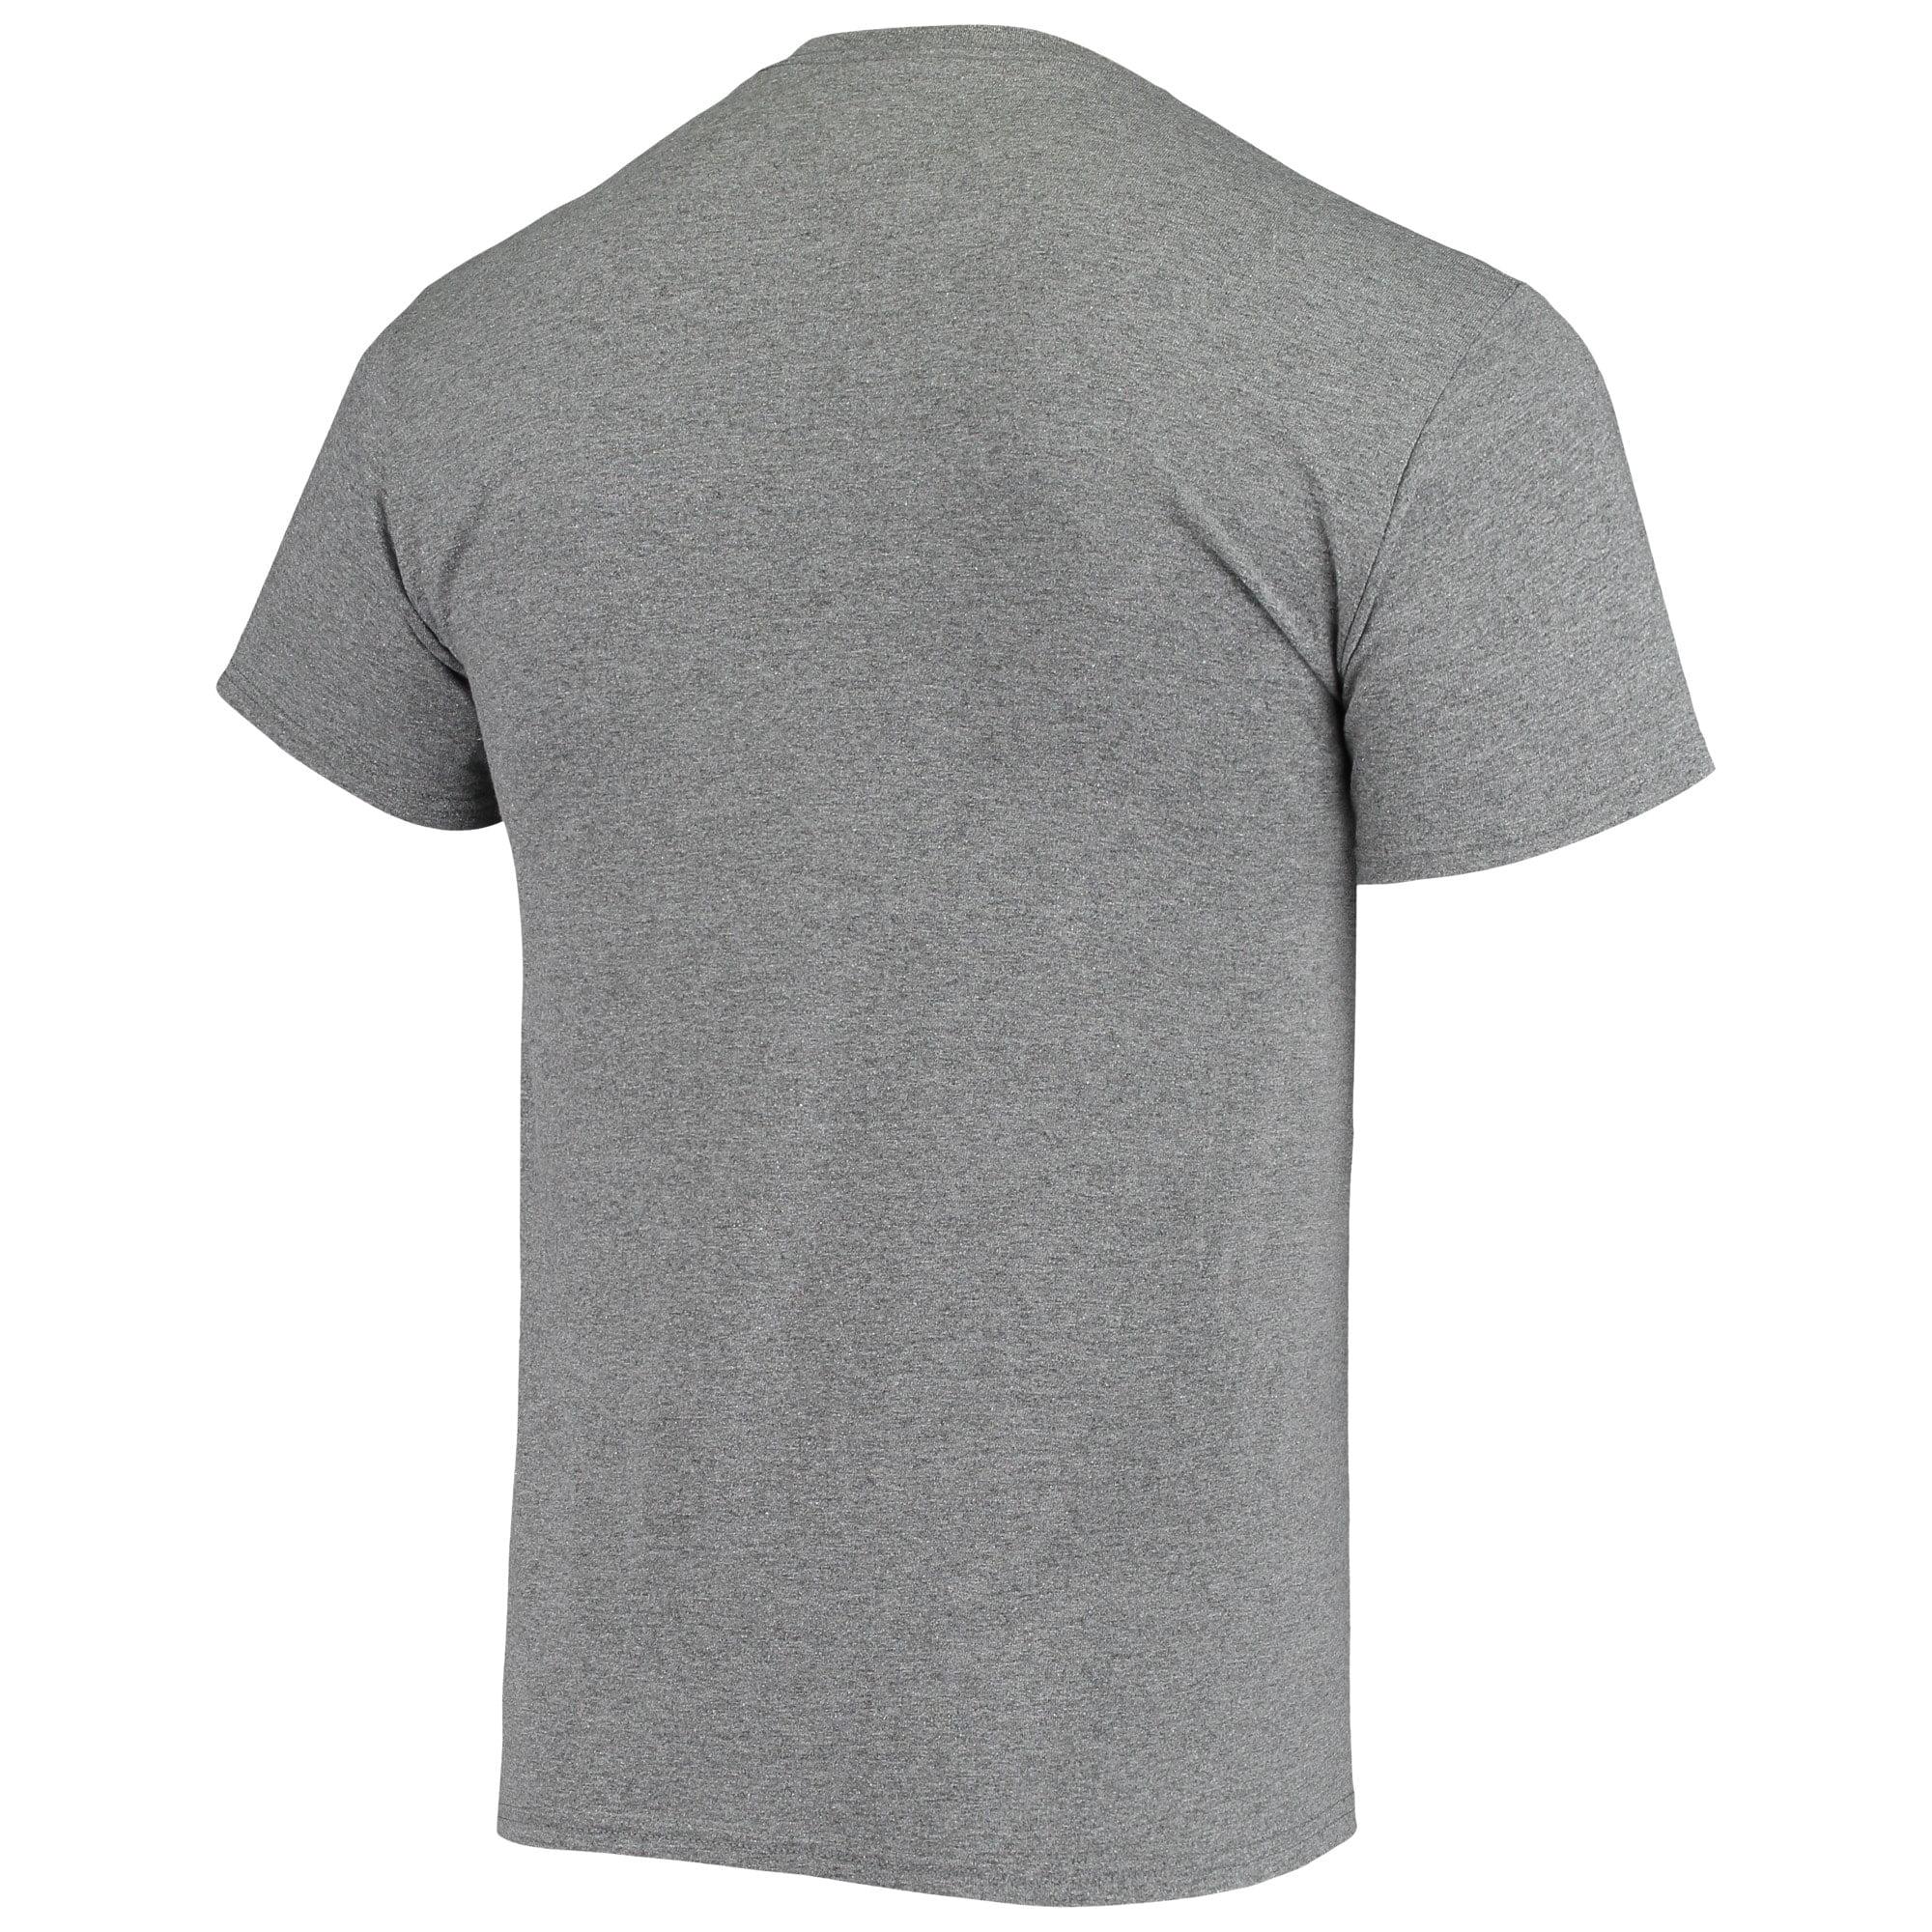 Gray,Medium NCAA Clemson Tigers Male T Shirt Dark Heather Arch